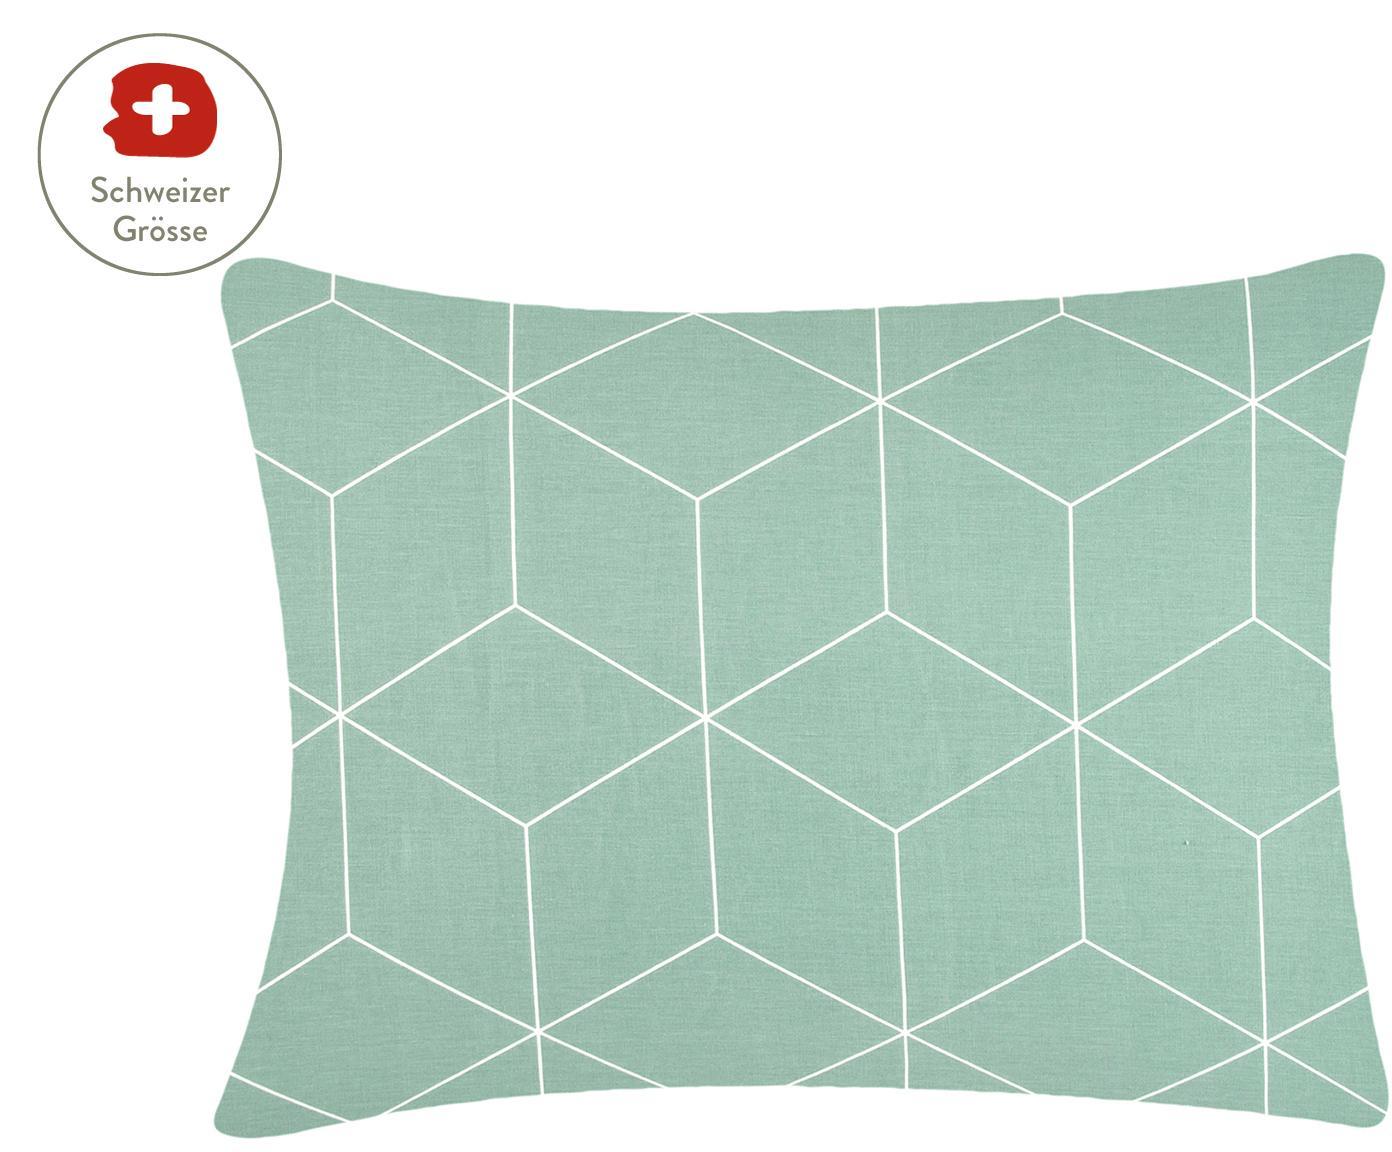 Baumwoll-Kissenbezug Lynn mit grafischem Muster, Webart: Renforcé Fadendichte 144 , Mint, Cremeweiss, 50 x 70 cm